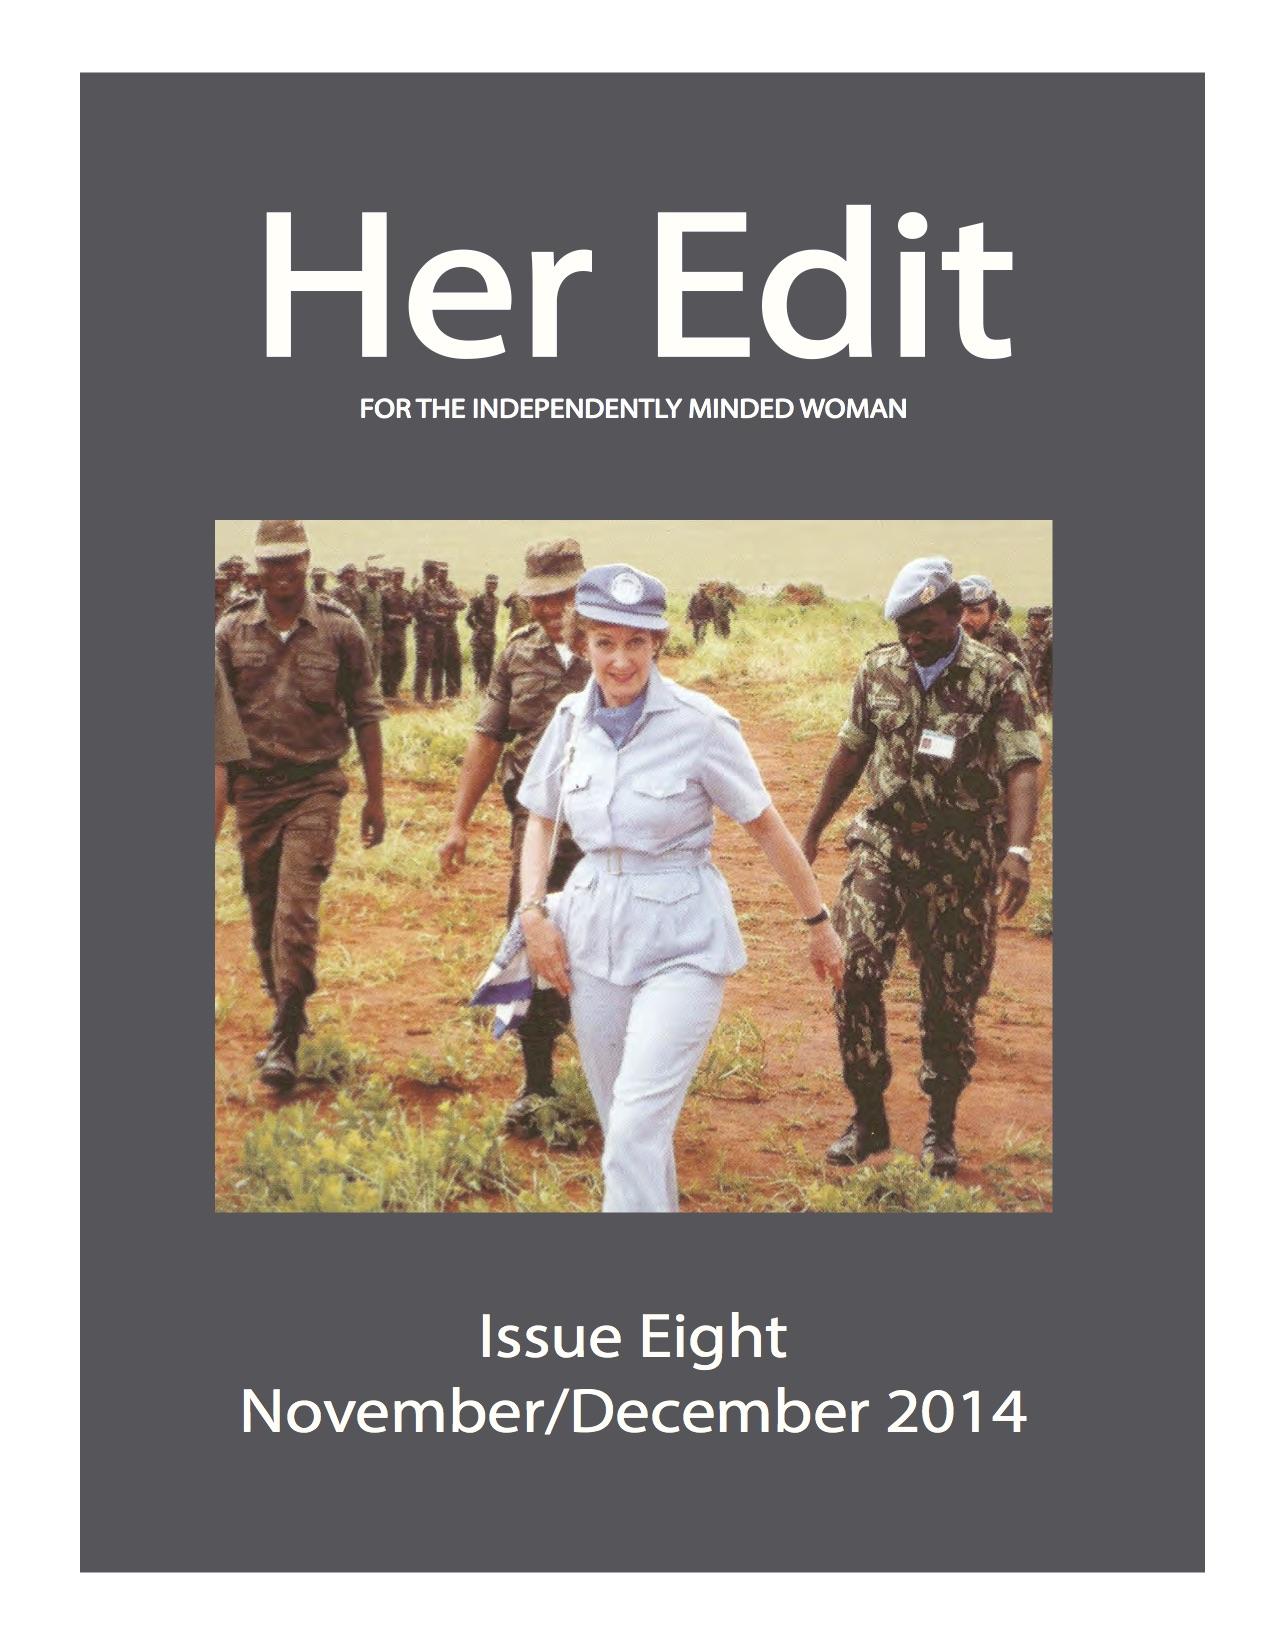 HerEdit-IssueEight-NovDec2014.jpg